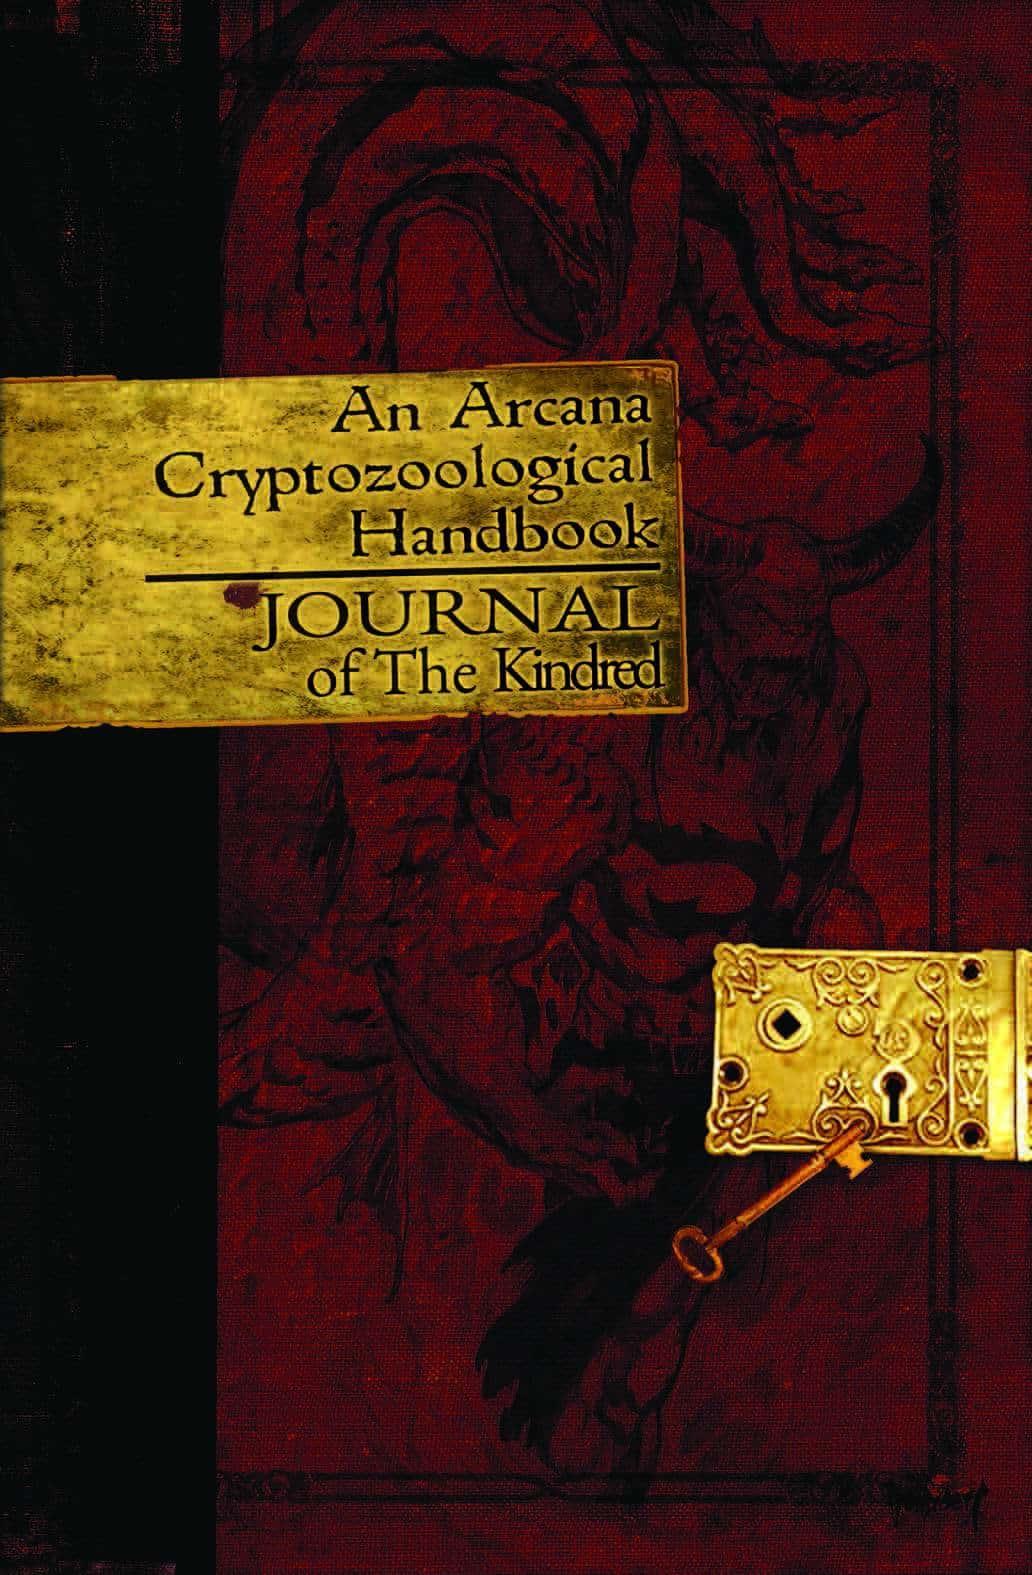 An Arcana Cryptozoology Handbook: Journal of the Kindred